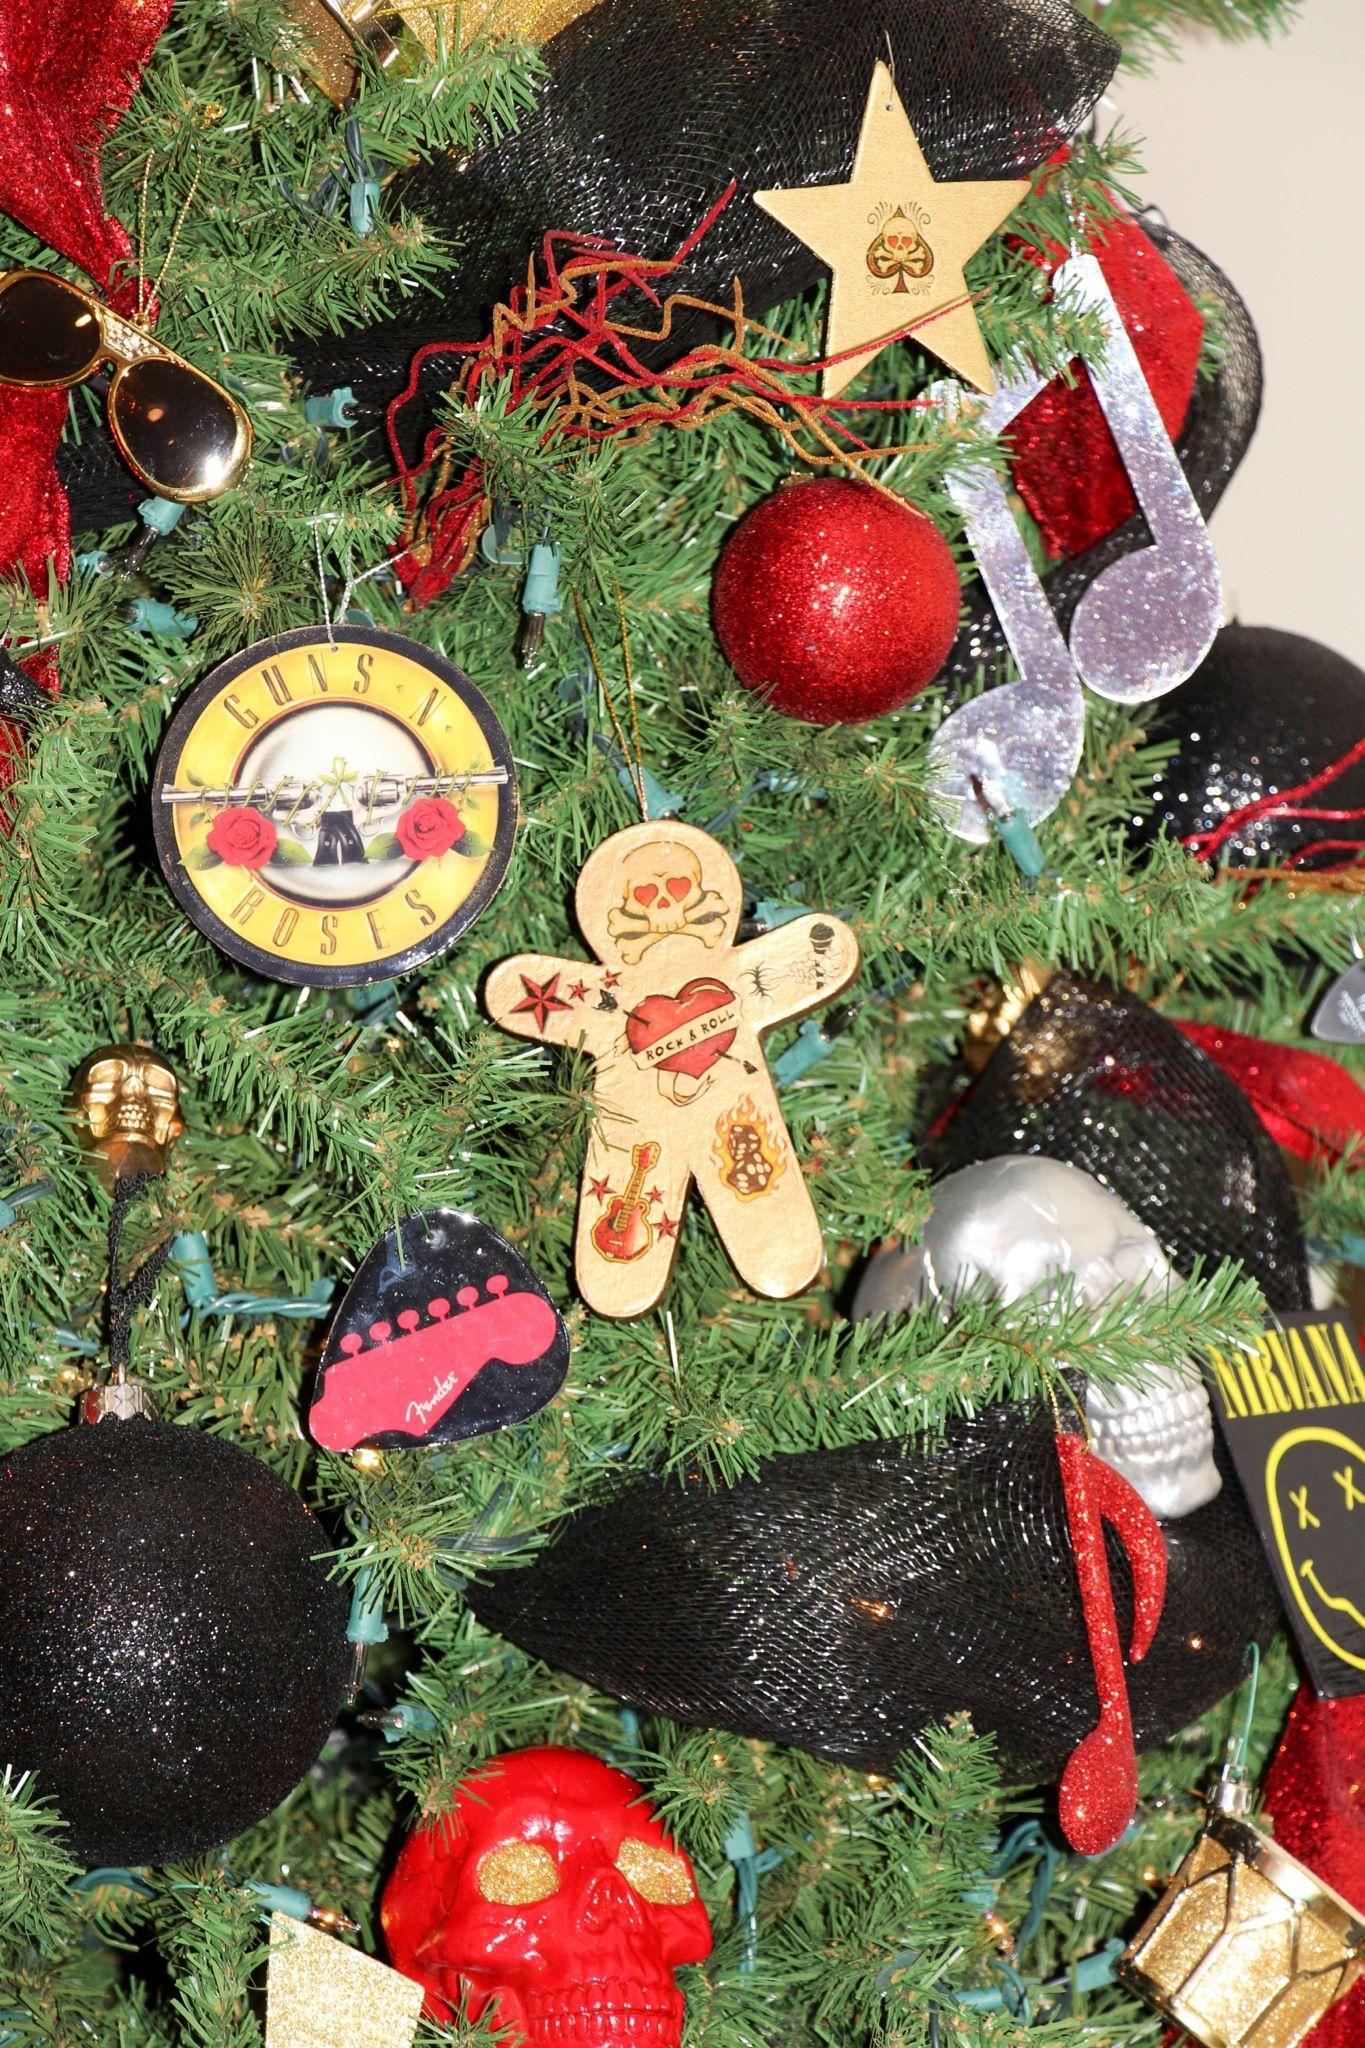 Rock N Roll Christmas Tree in the basement | Christmas spirit, Christmas jingles, Christmas tree ...